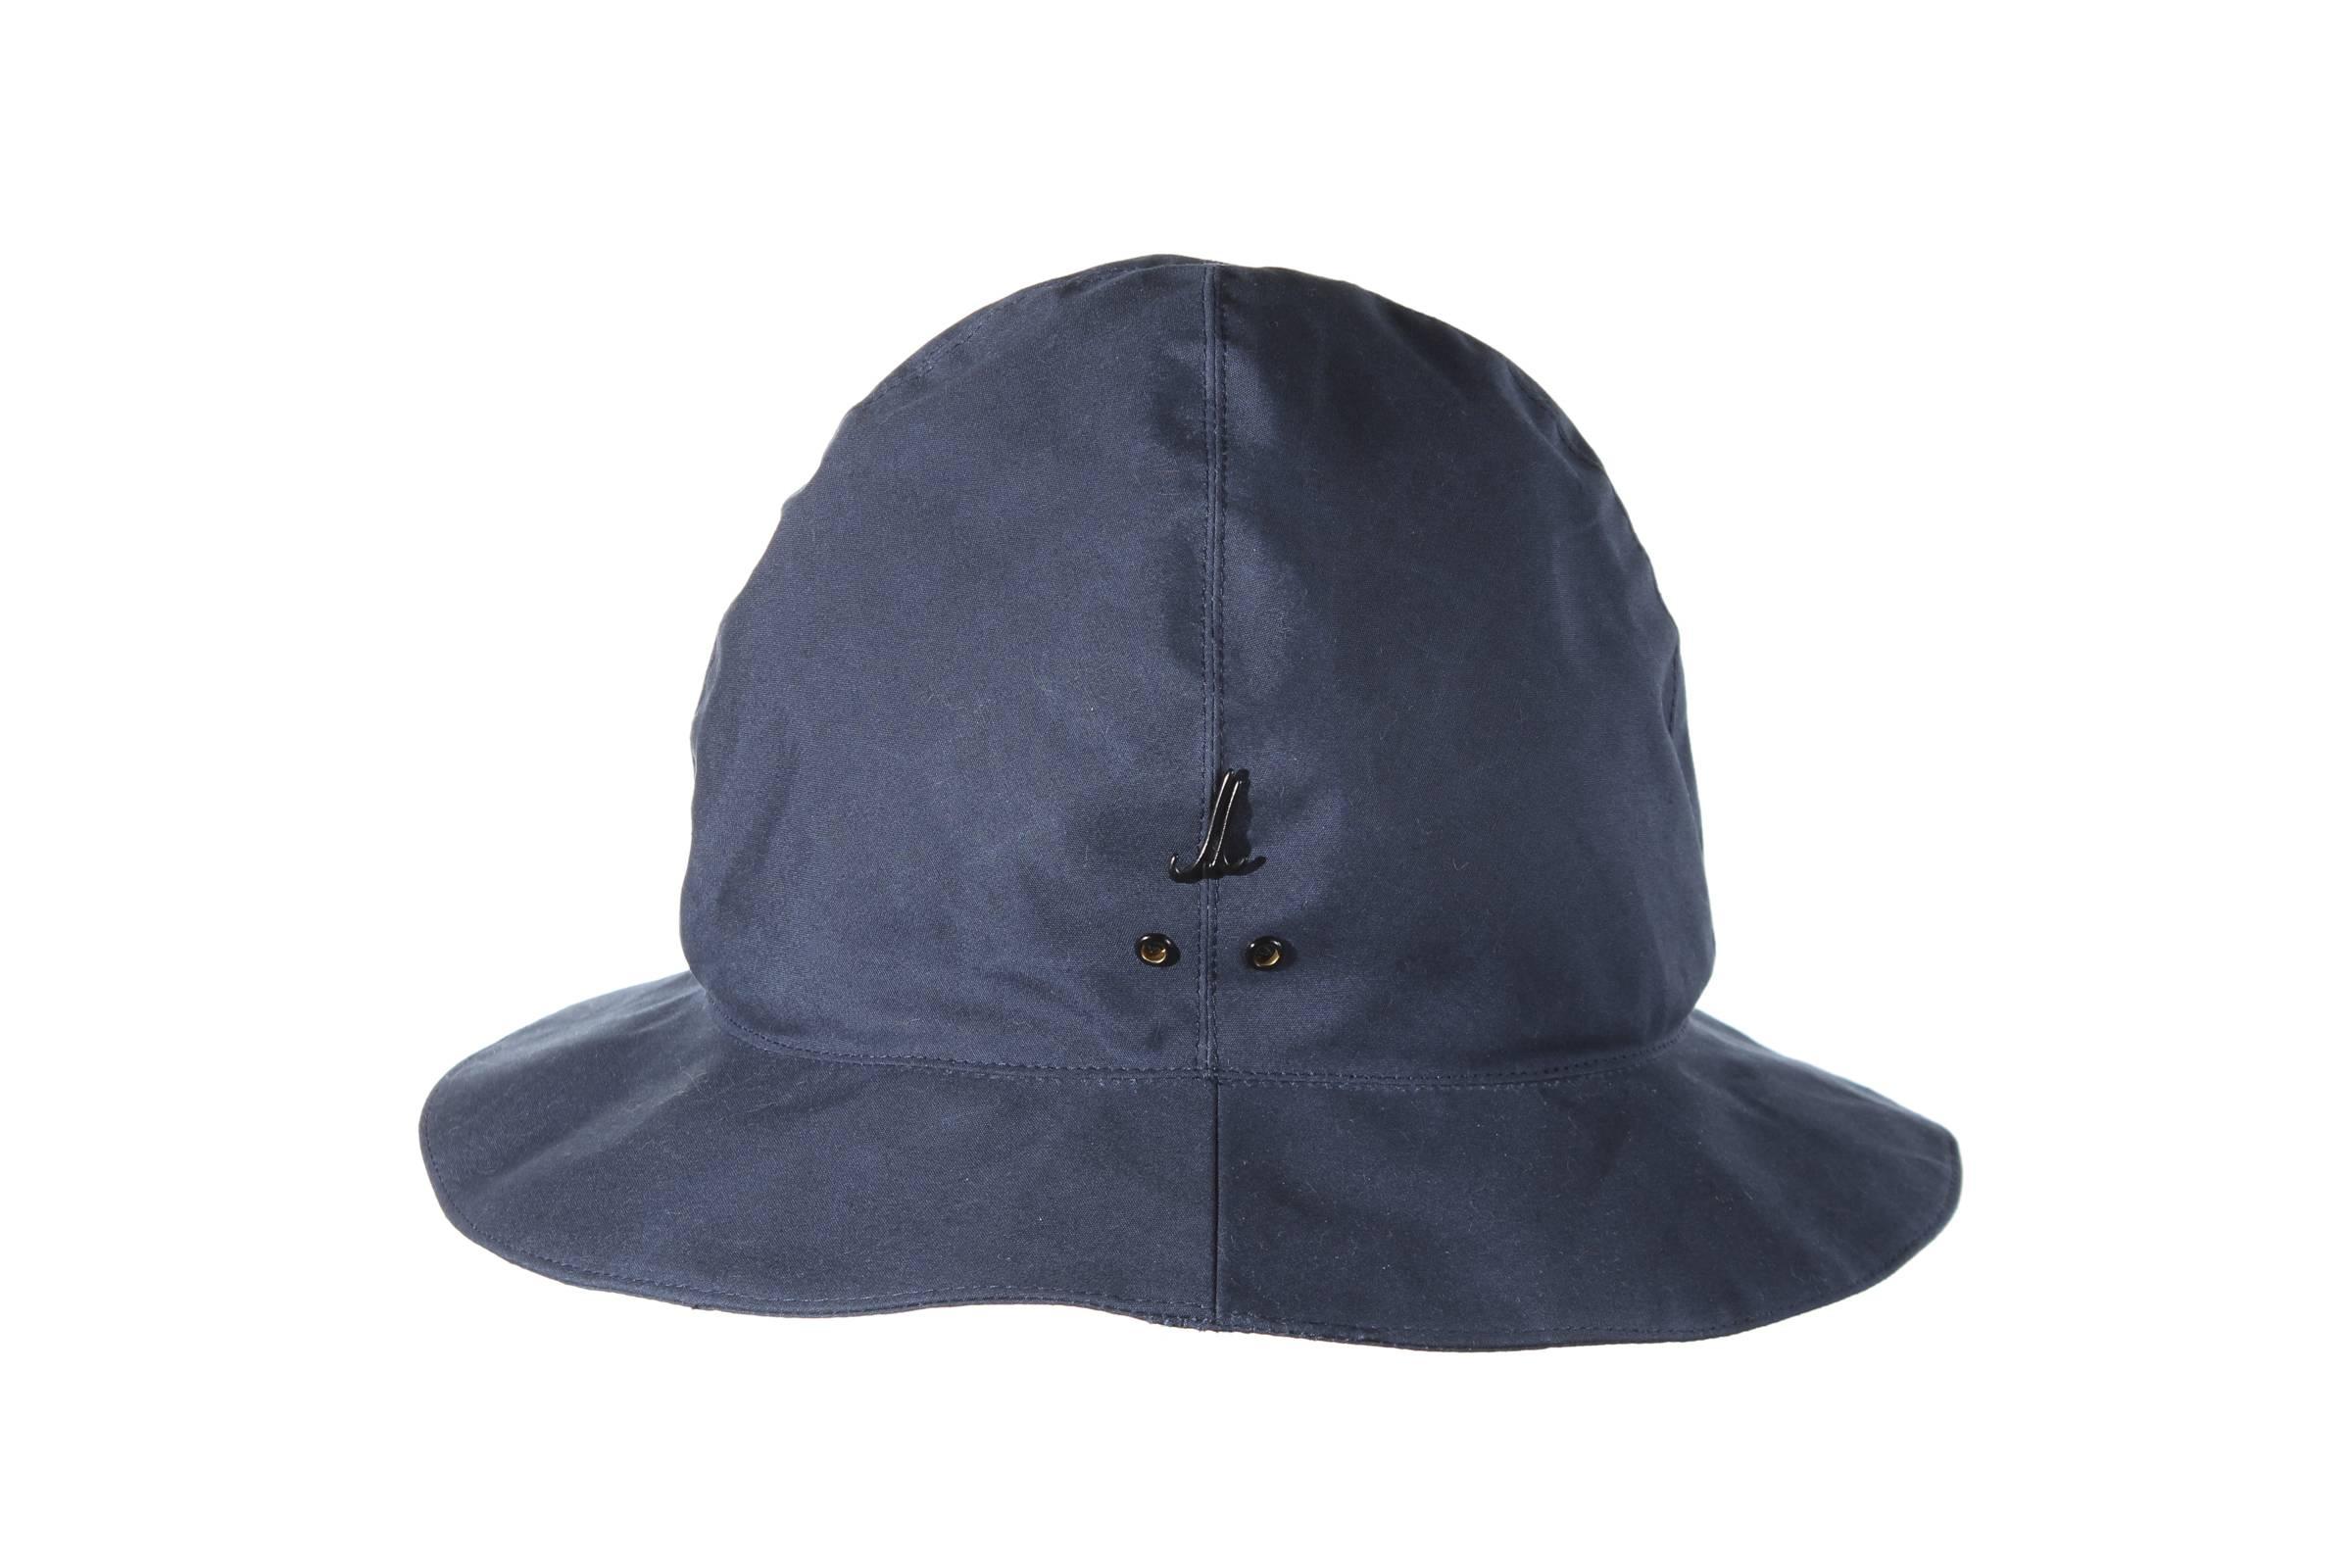 FRANCIS - rain hat - Baumwolle gewachst  34d5084ff4c